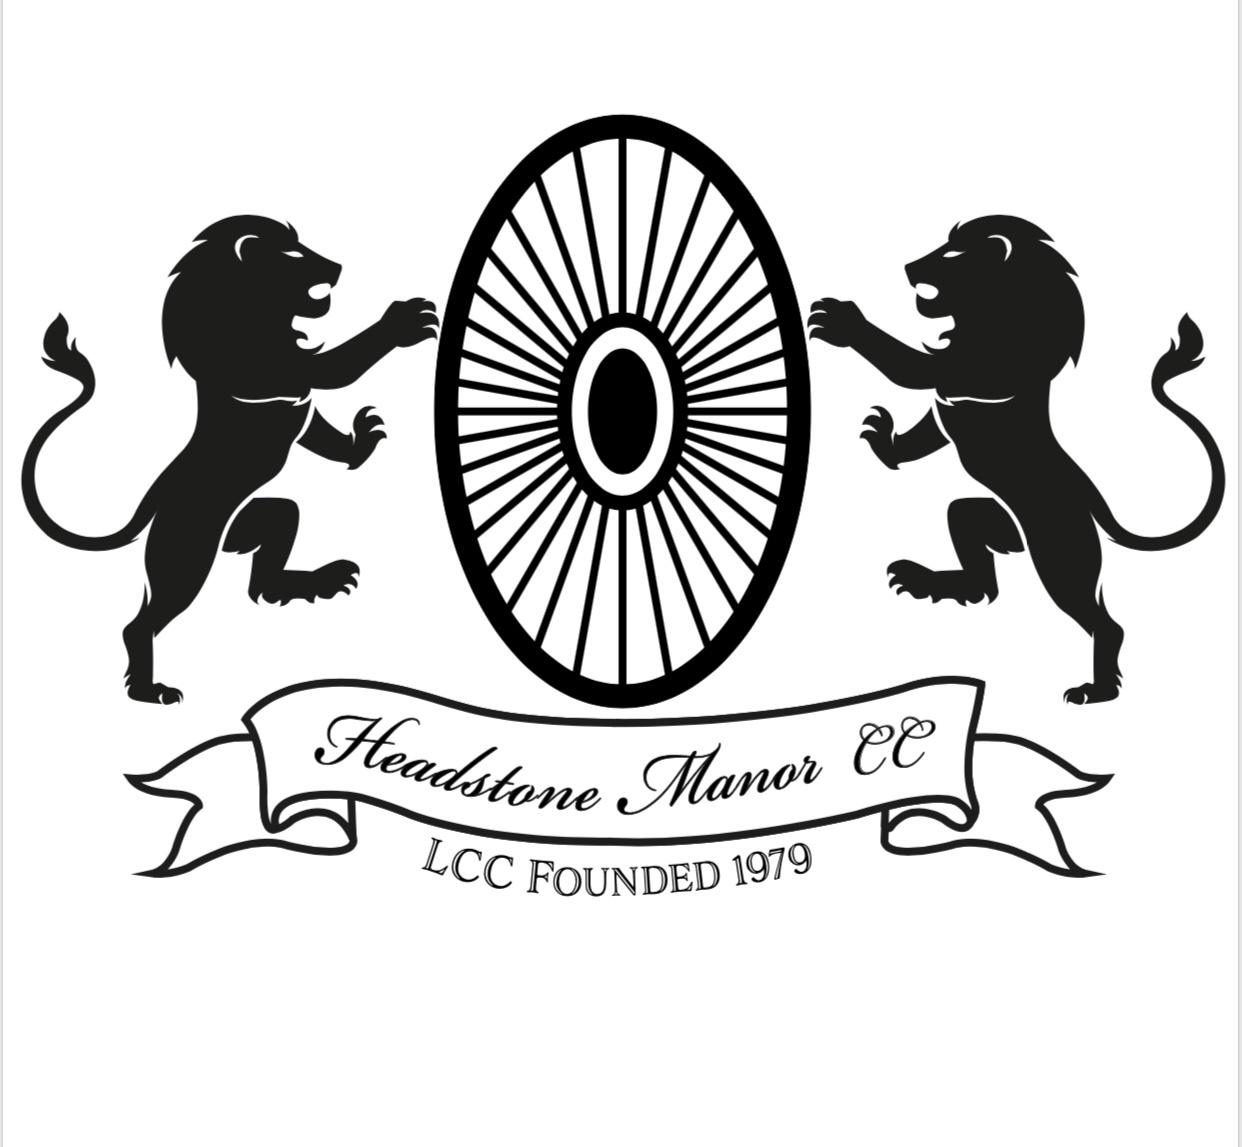 Headstone Manor CC